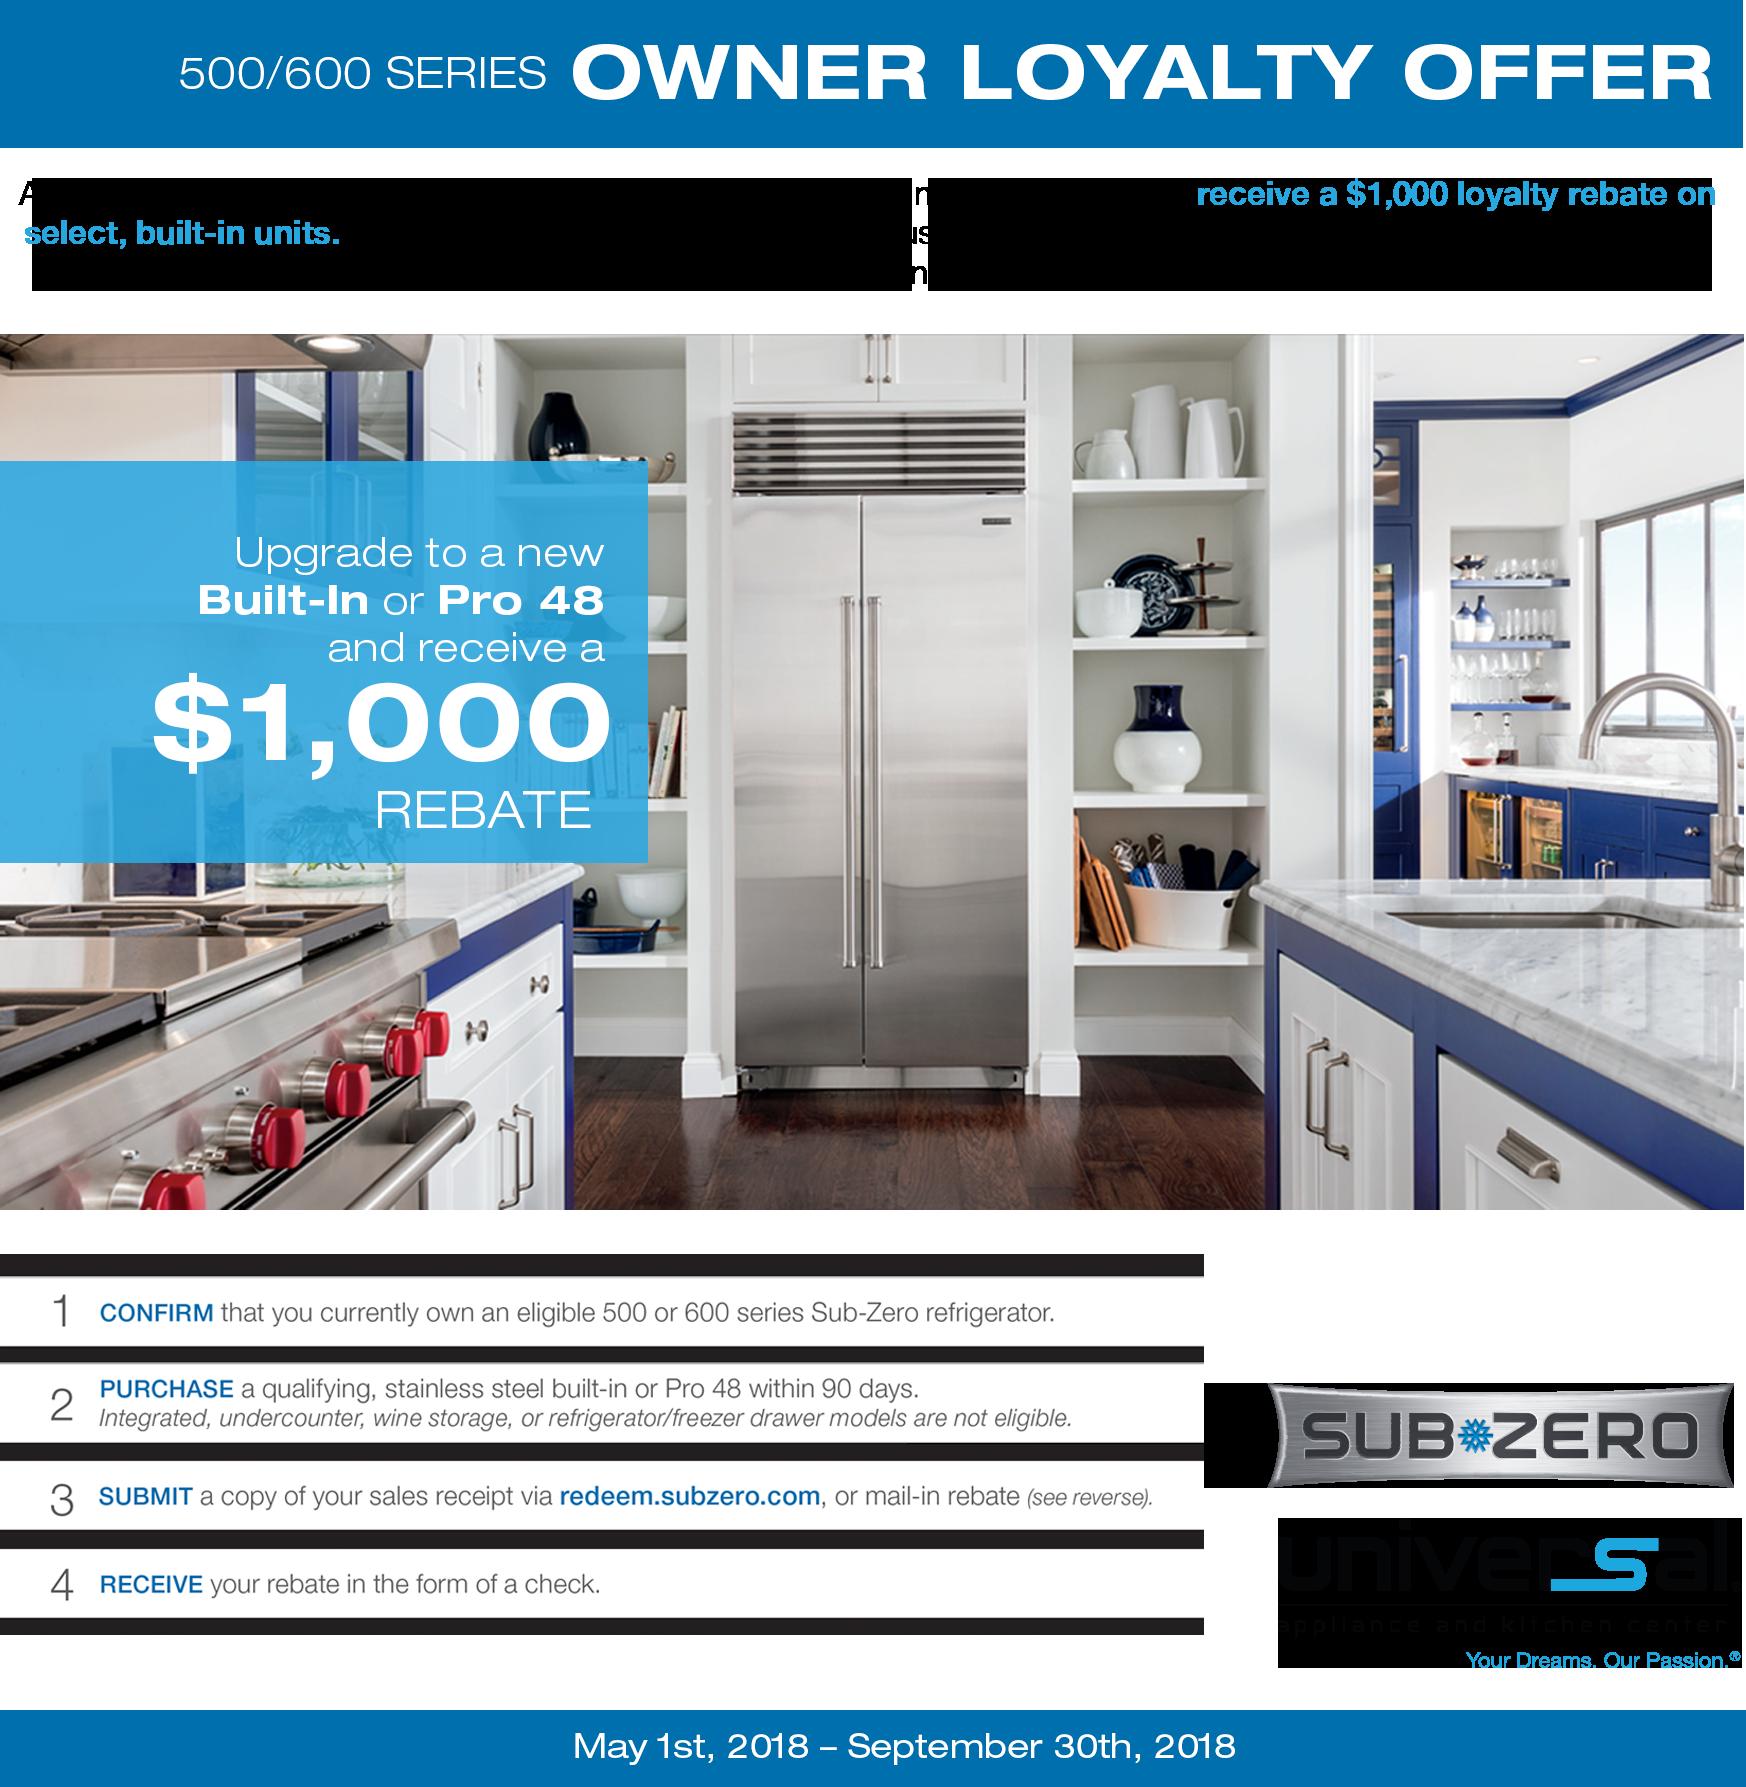 Universal Liance And Kitchen Center Boasts A Great Range Of Sub Zero Refrigerators Freezers Providing The Storage E Your Needs